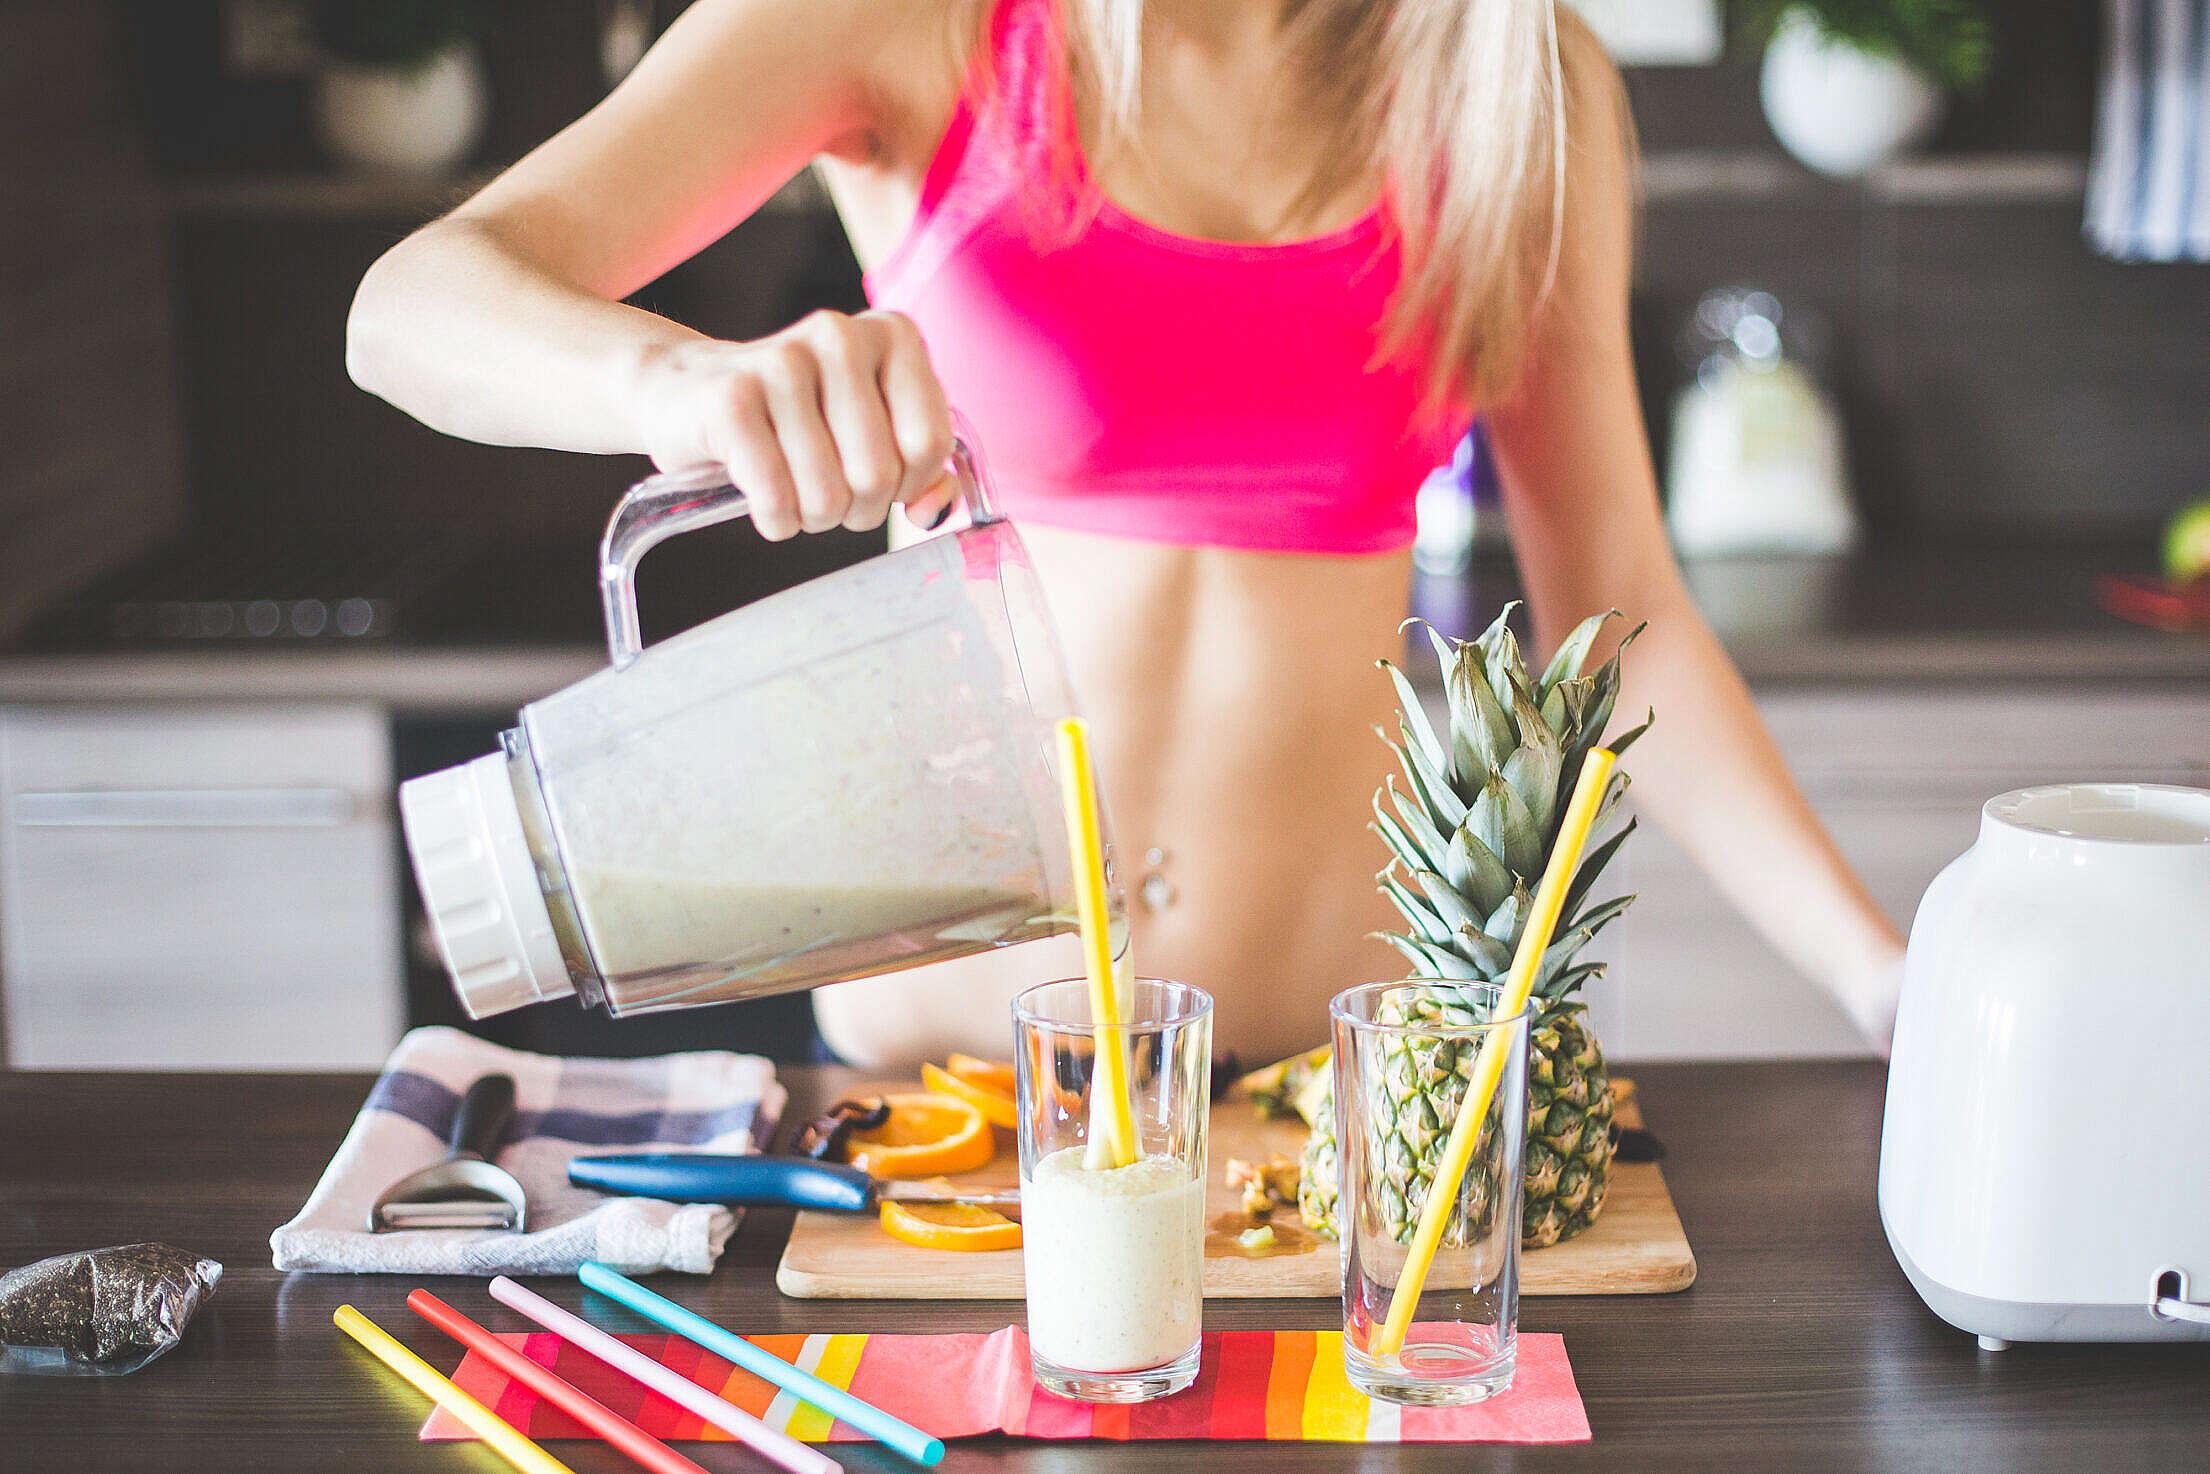 Fitness Girl Preparing Healthy Smoothie Free Stock Photo